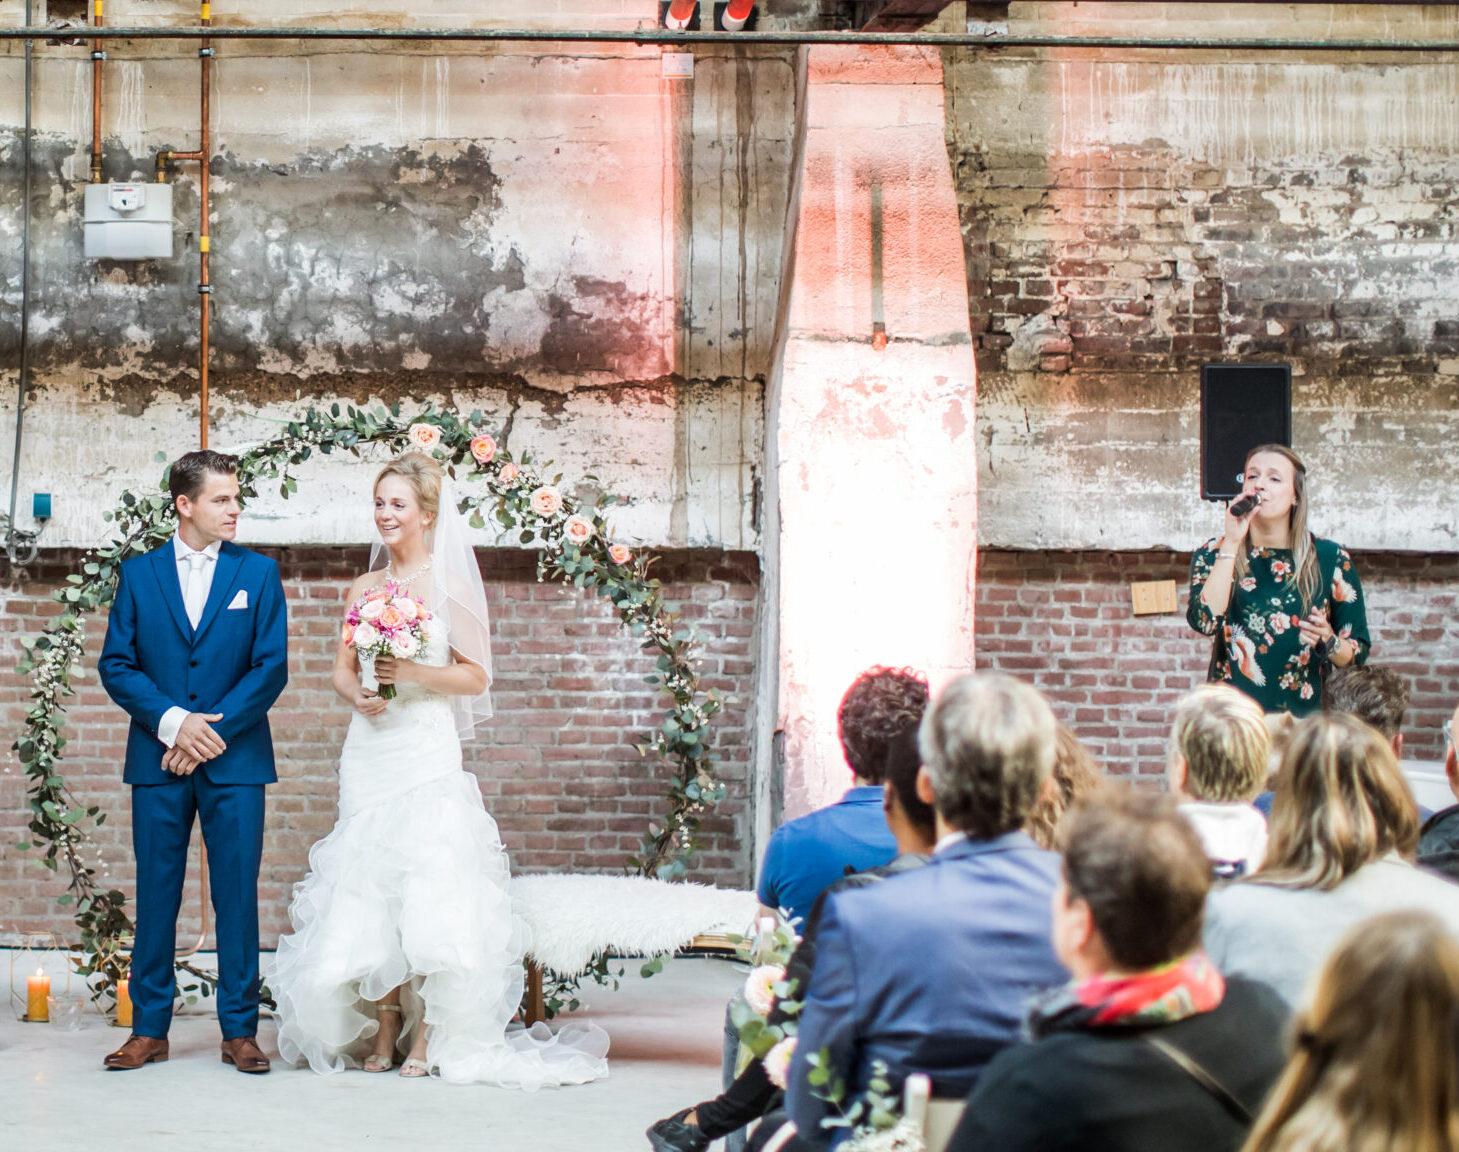 Live muziek op je bruiloft, dé kers op jullie bruidstaart